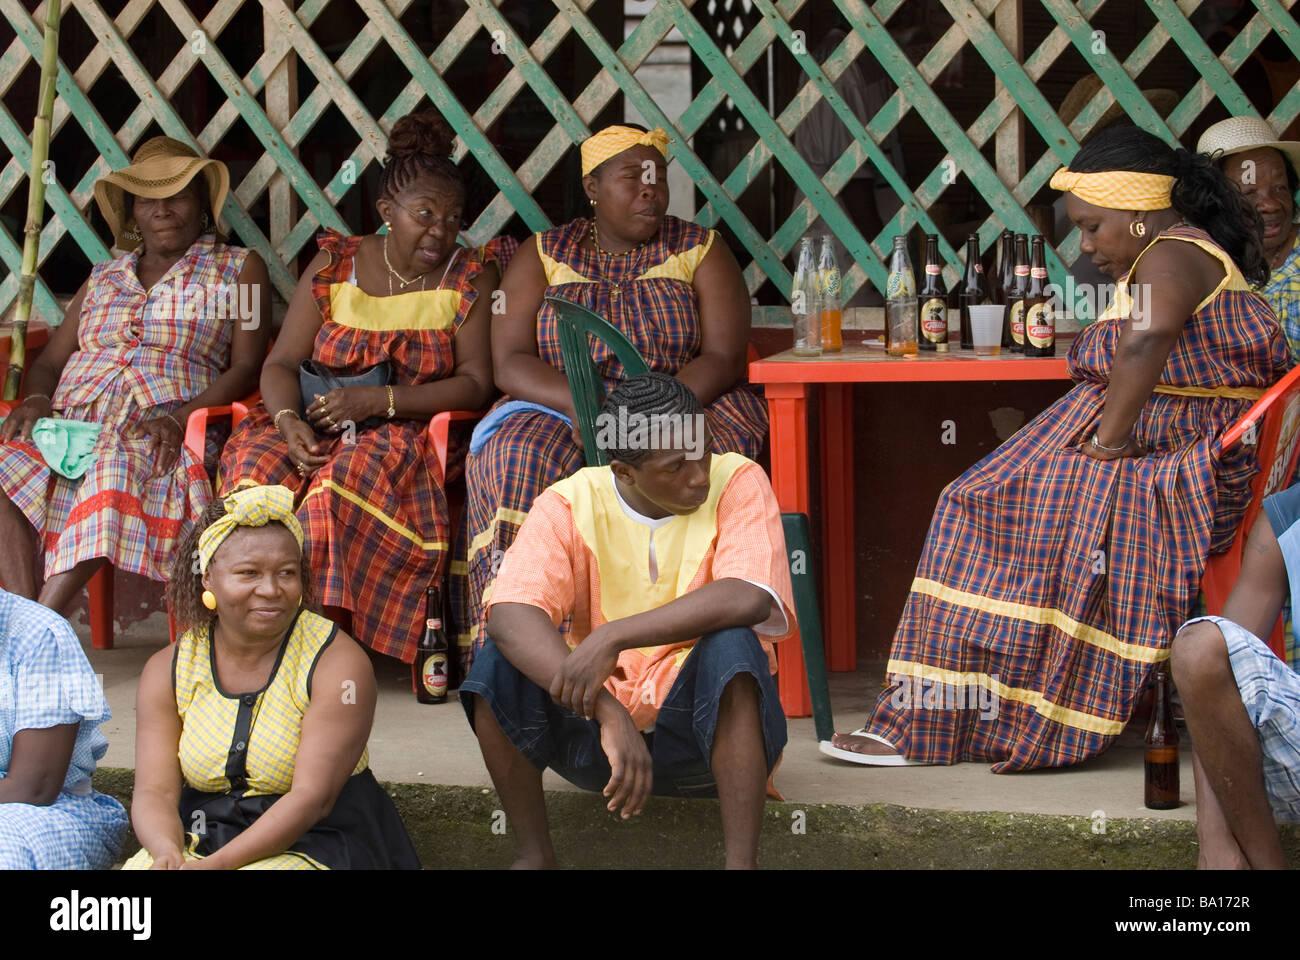 Garifuna people gathering at the annual Garifuna festival. Livingston, Guatemala. - Stock Image